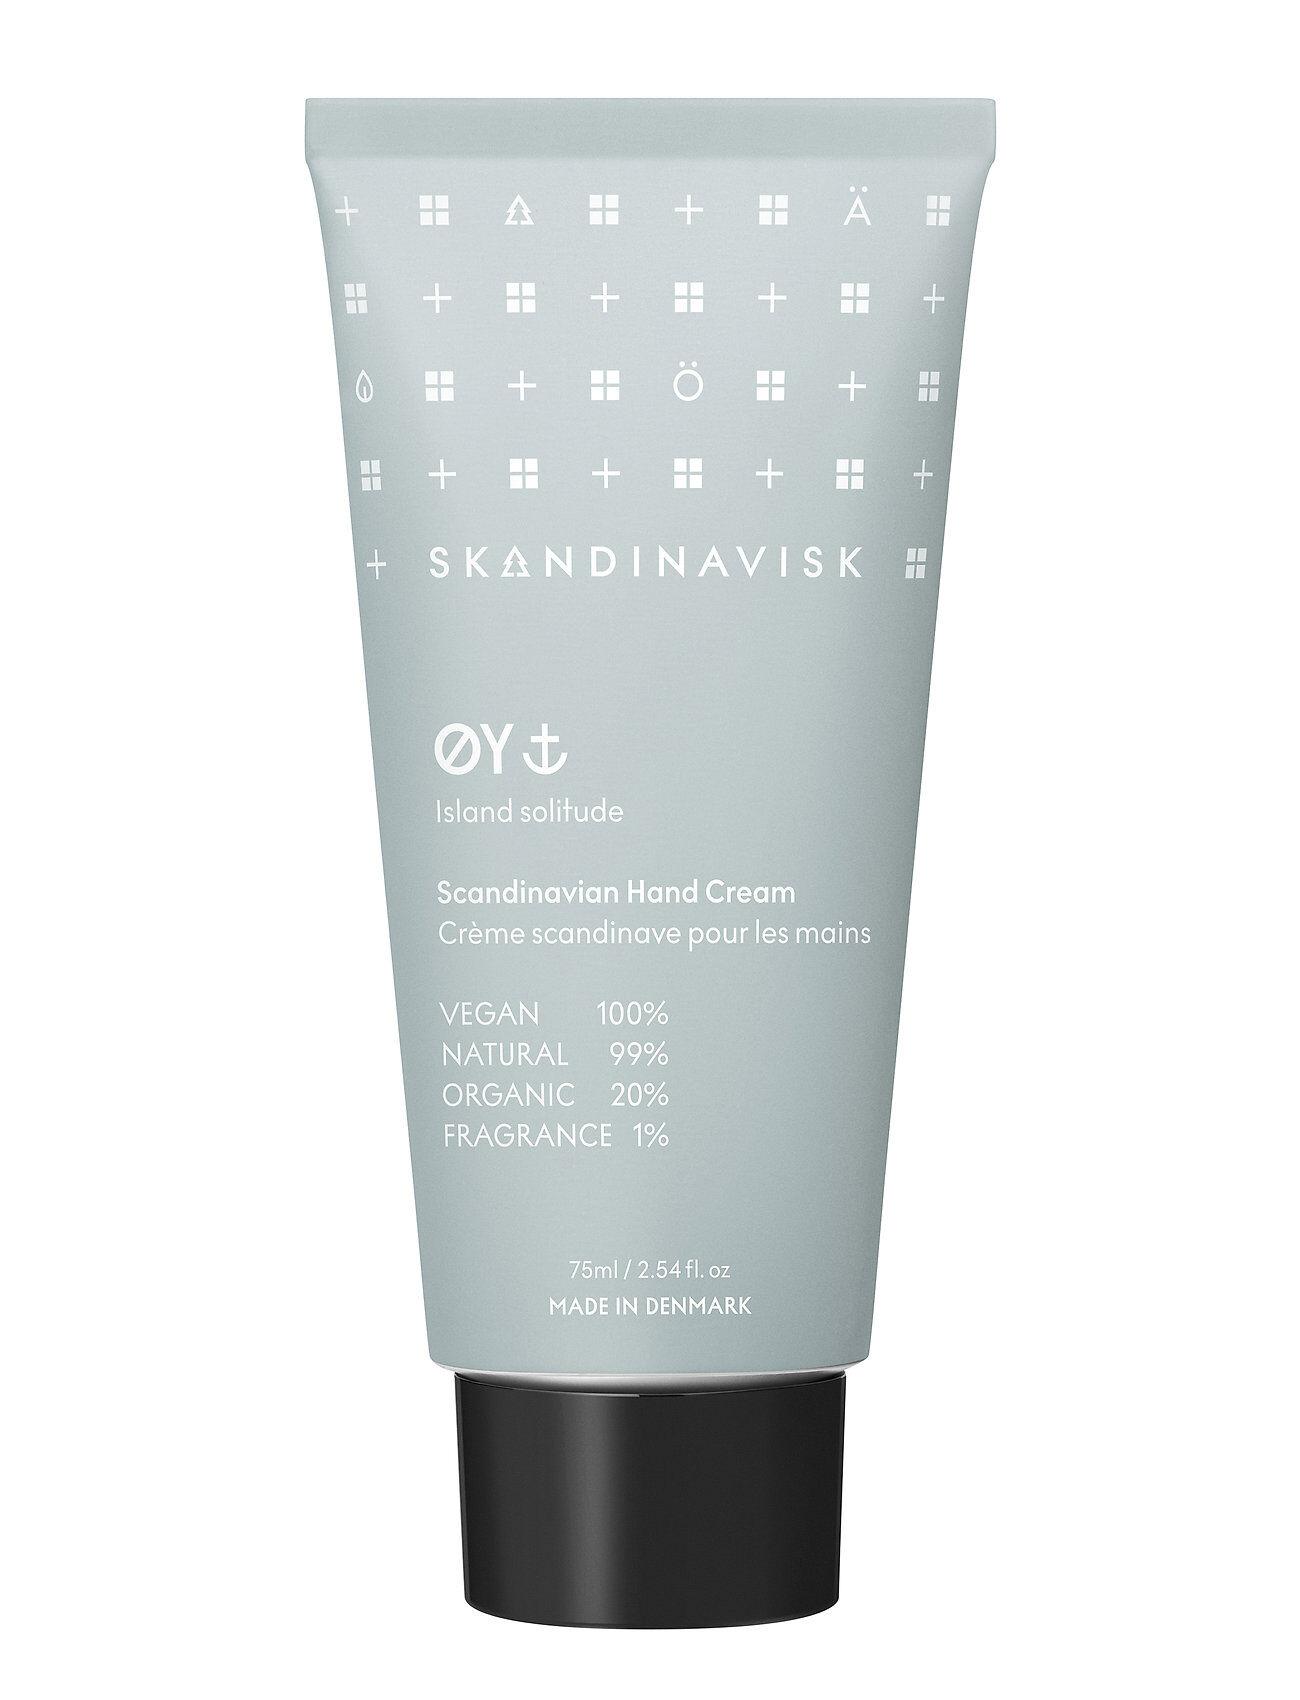 Skandinavisk ØY Hand Cream 75ml Beauty MEN Skin Care Body Hand Cream Nude Skandinavisk